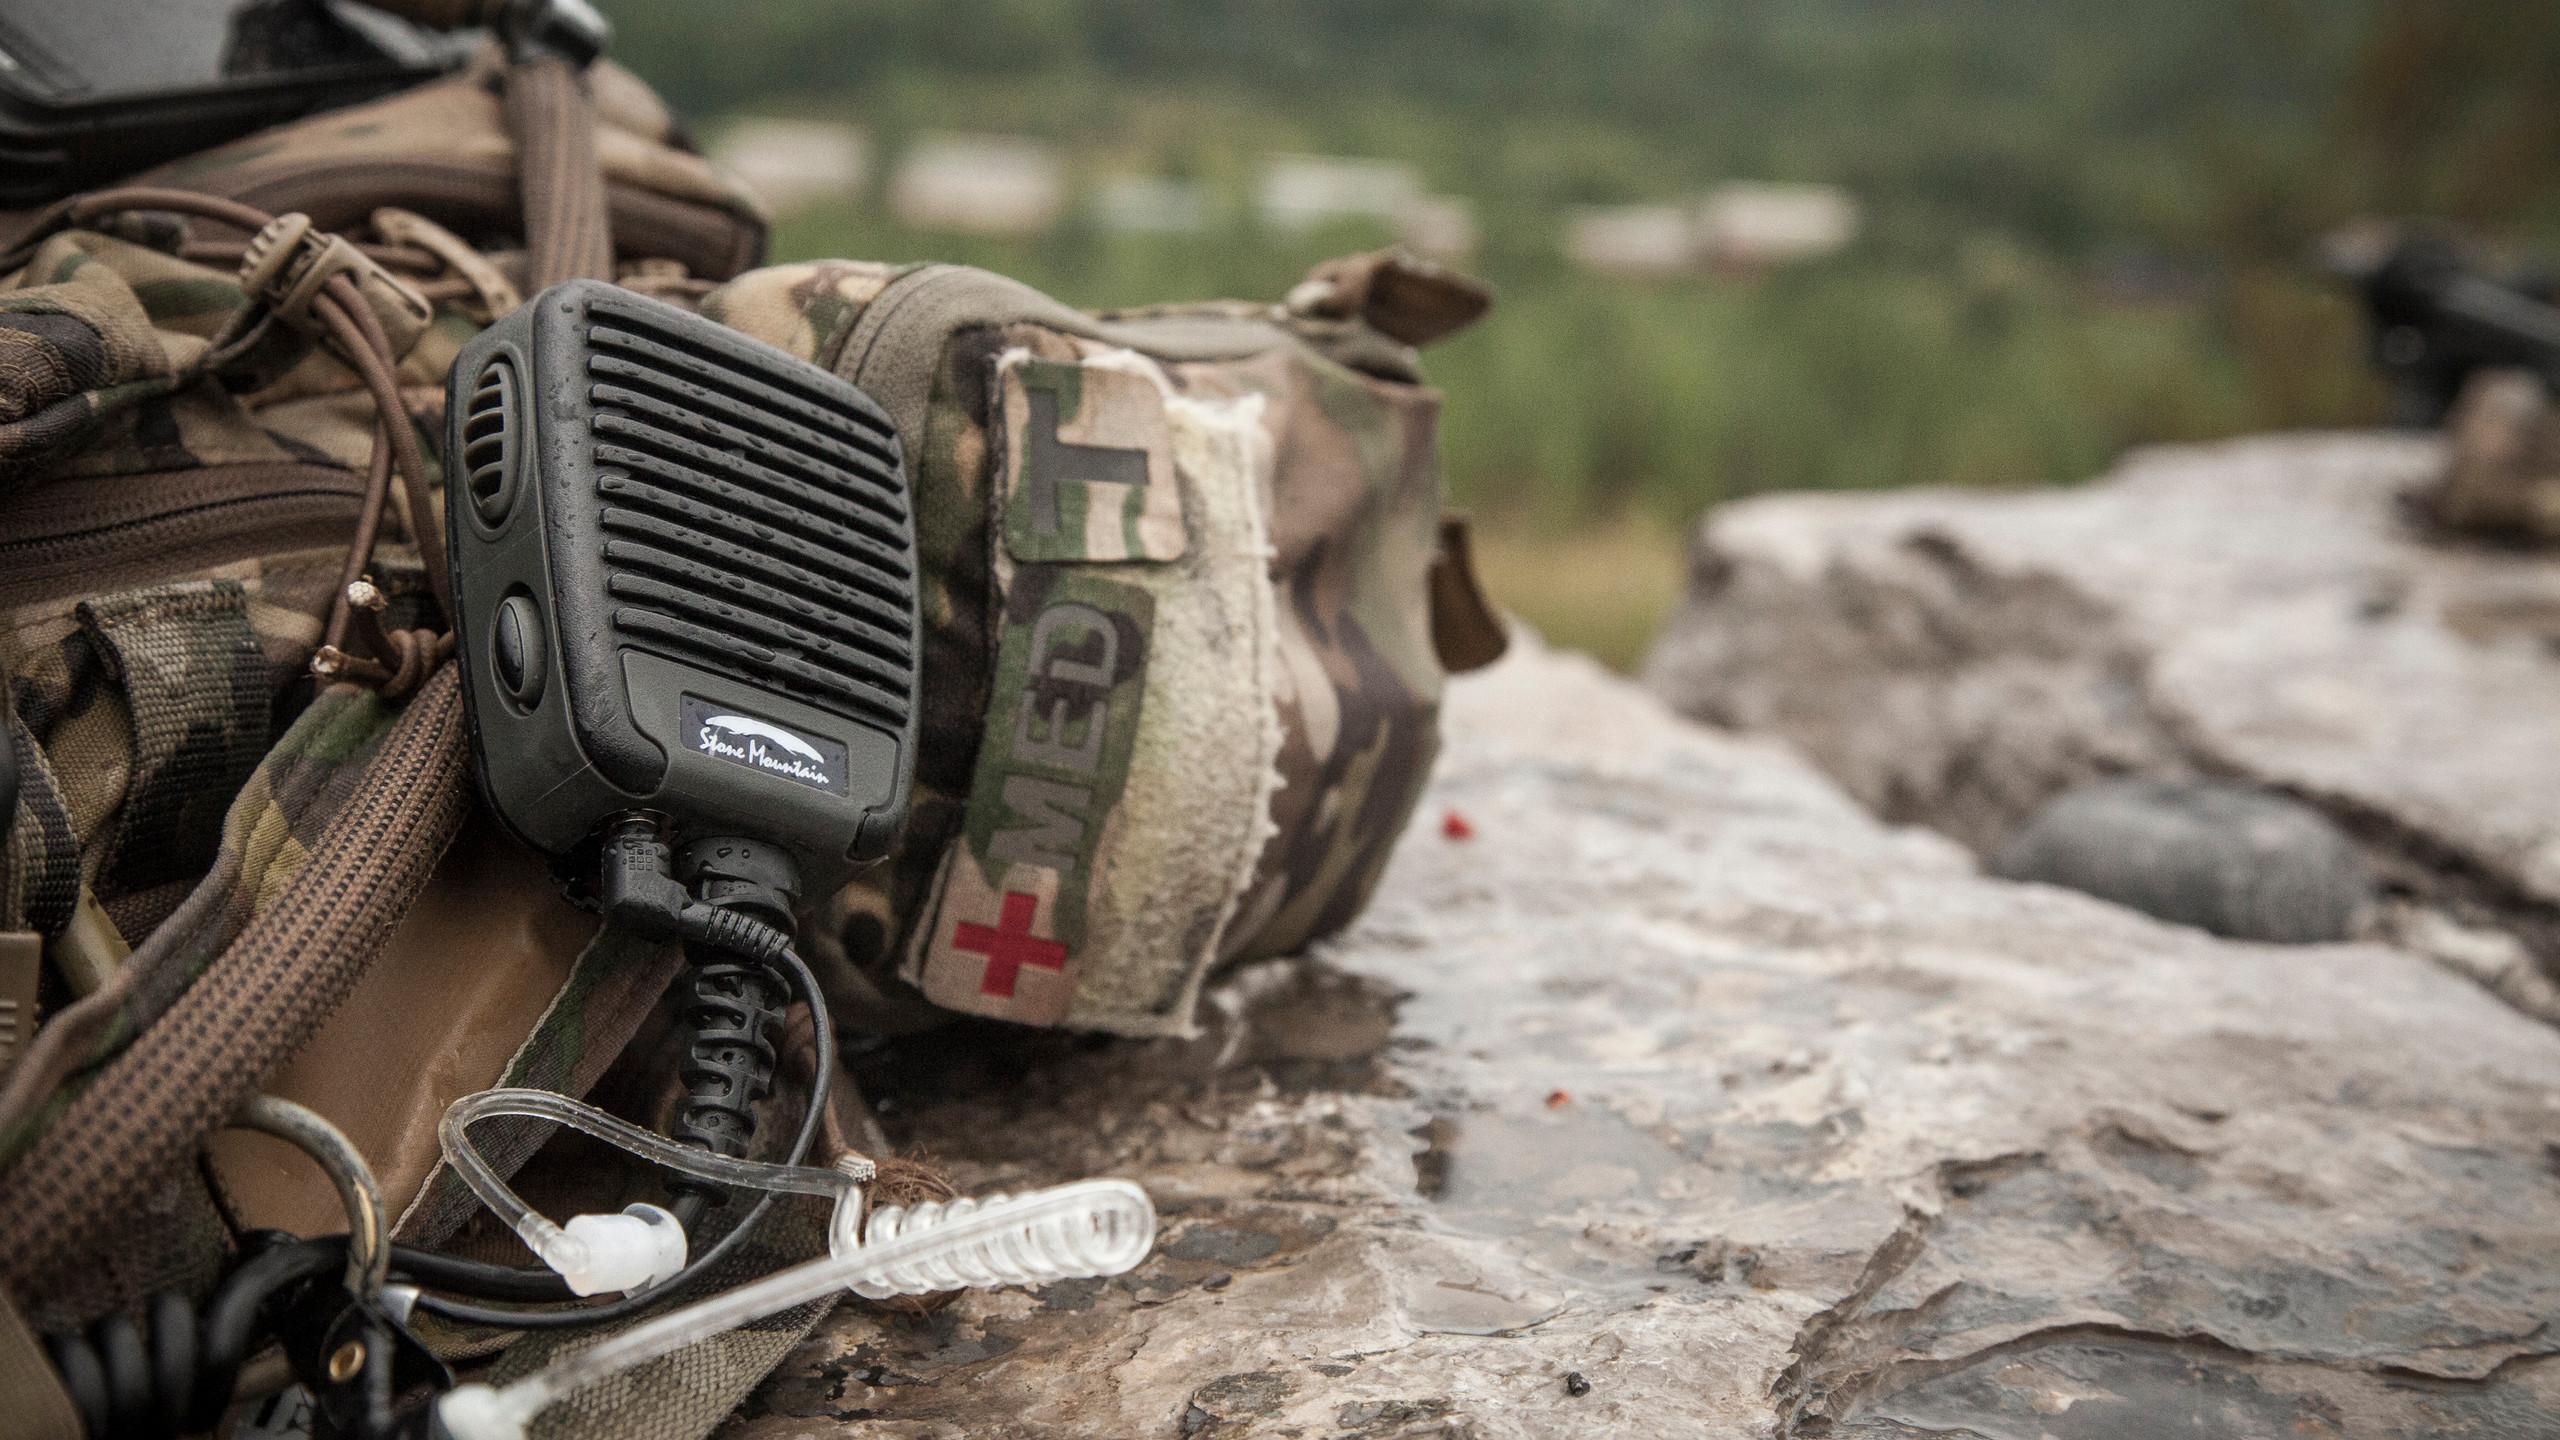 Stone Mountain Ltd Phoenix Elite PoC RSM speaker microphone Blackline simulations airsoft military simulations tactical zello accessories review